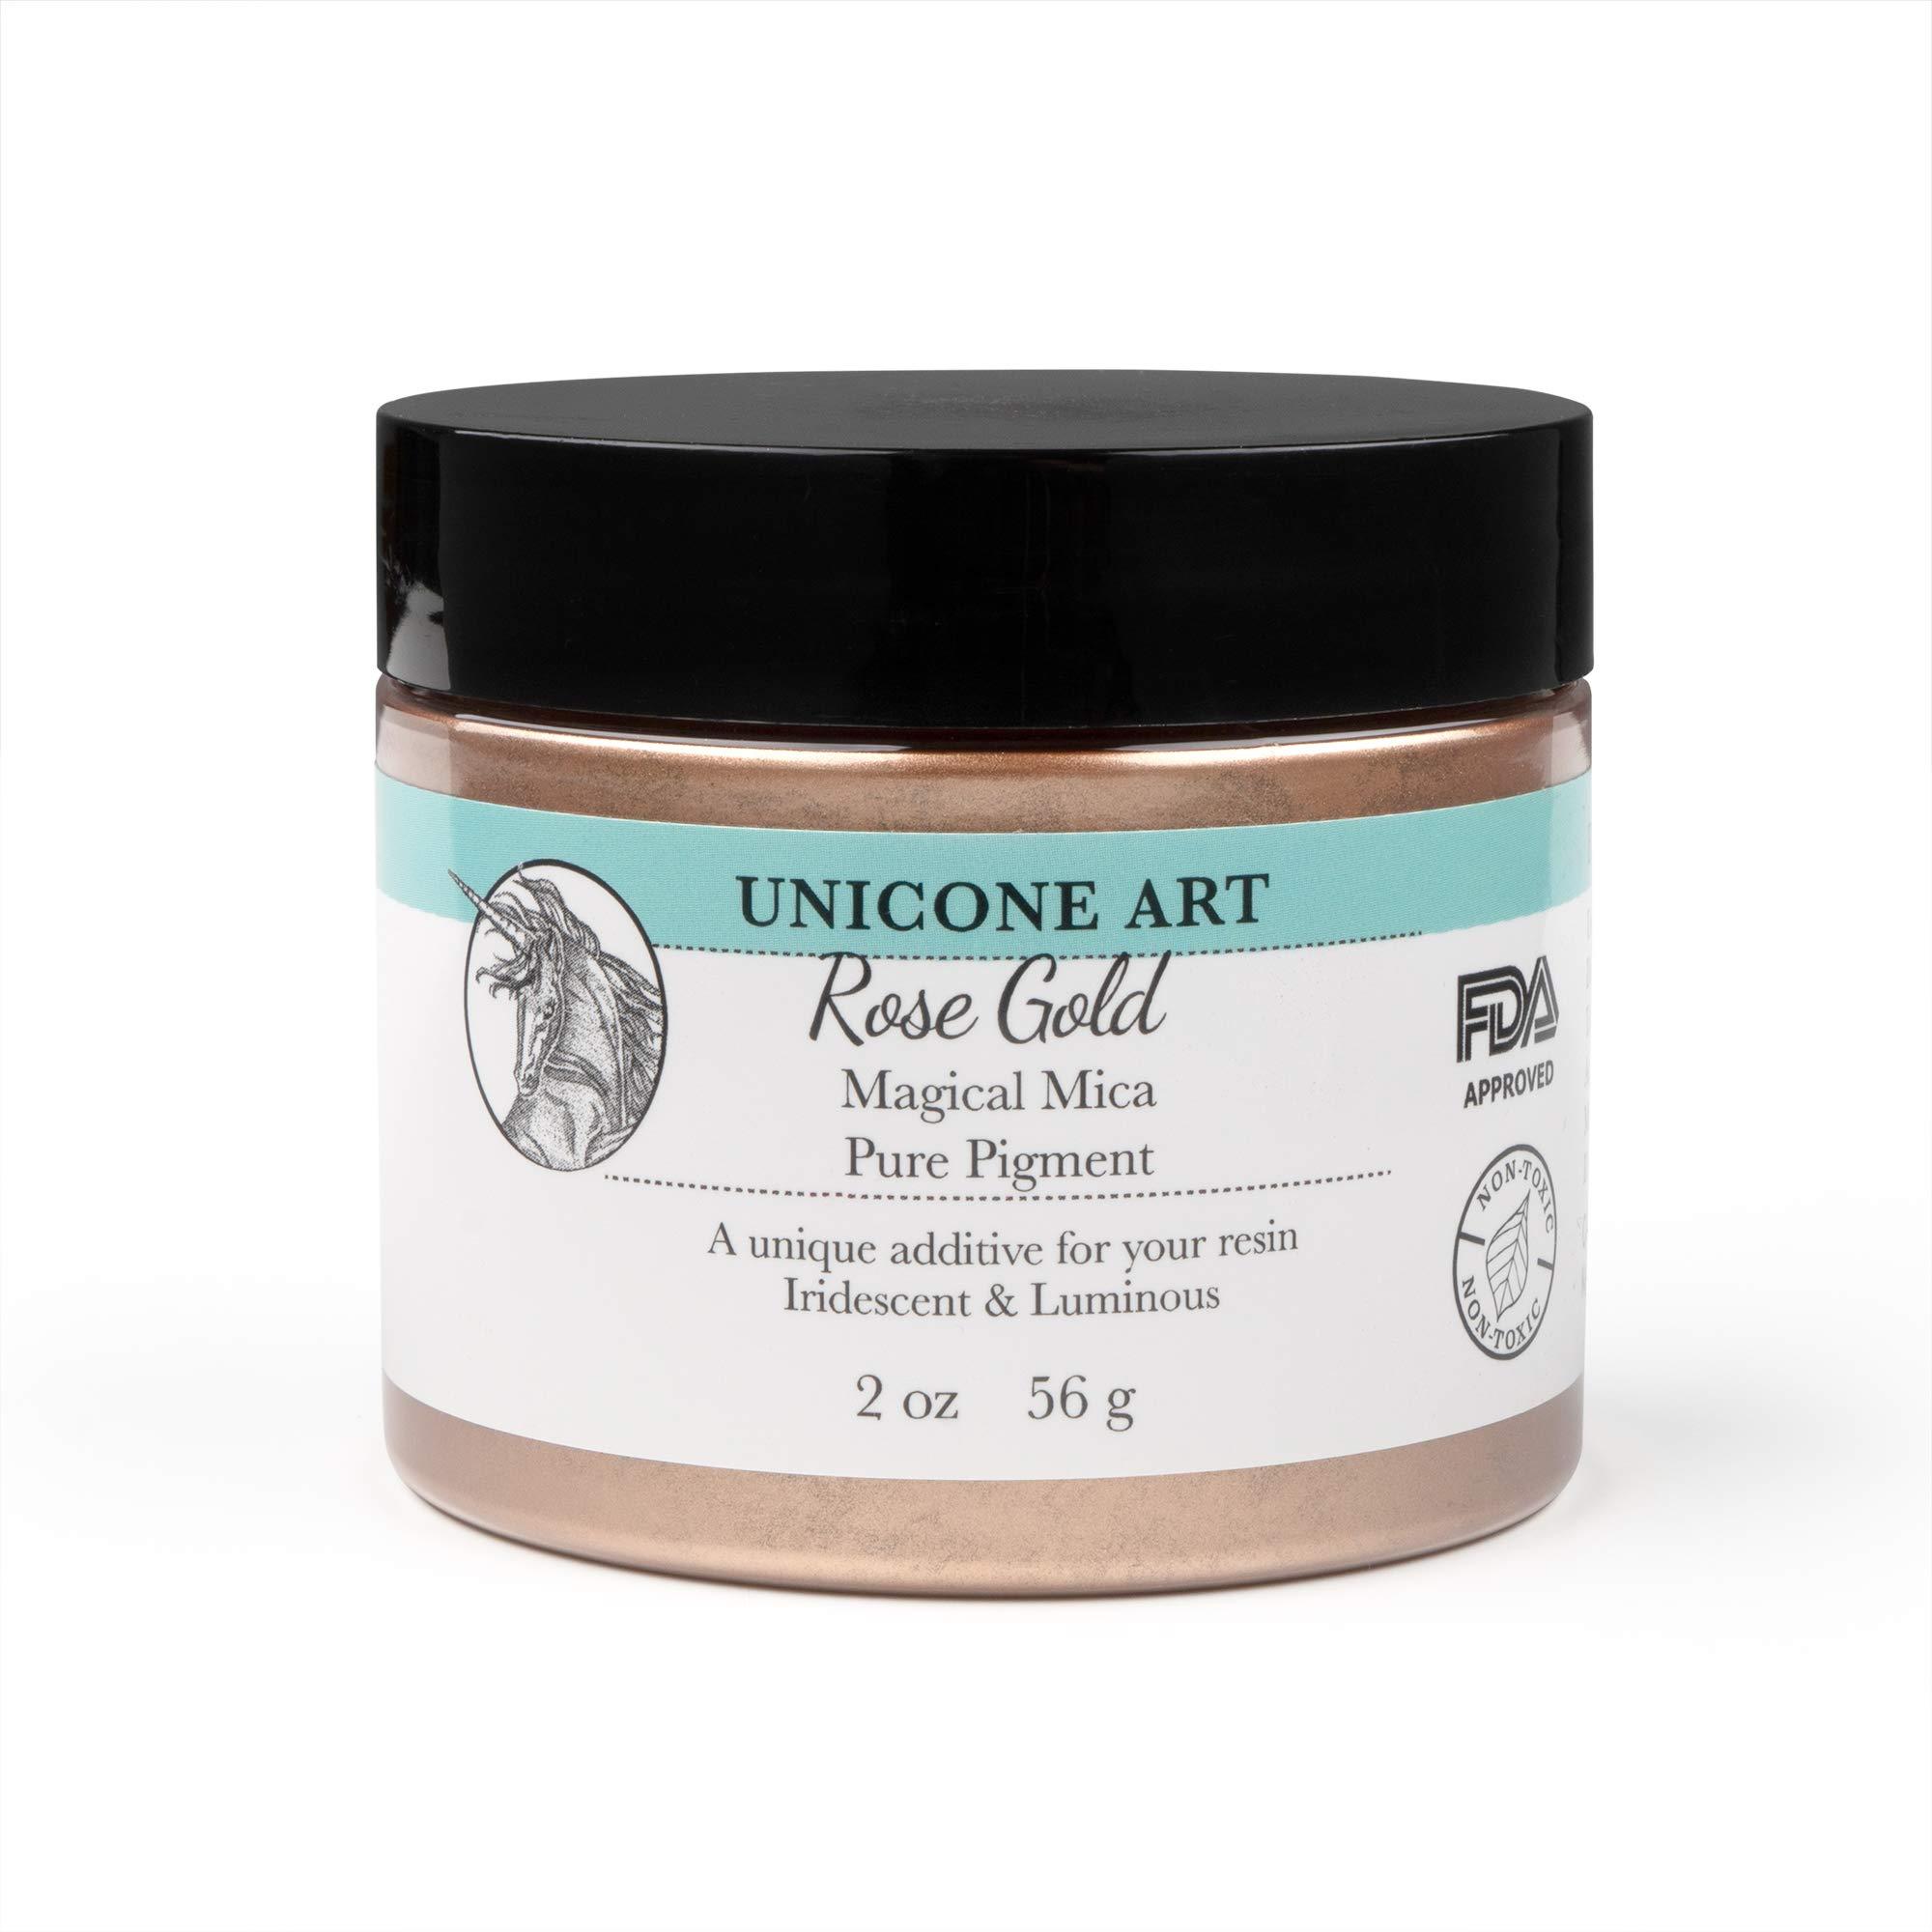 Rose Gold Magical Mica Pigment Powder, Unicone Art - Multi-Use